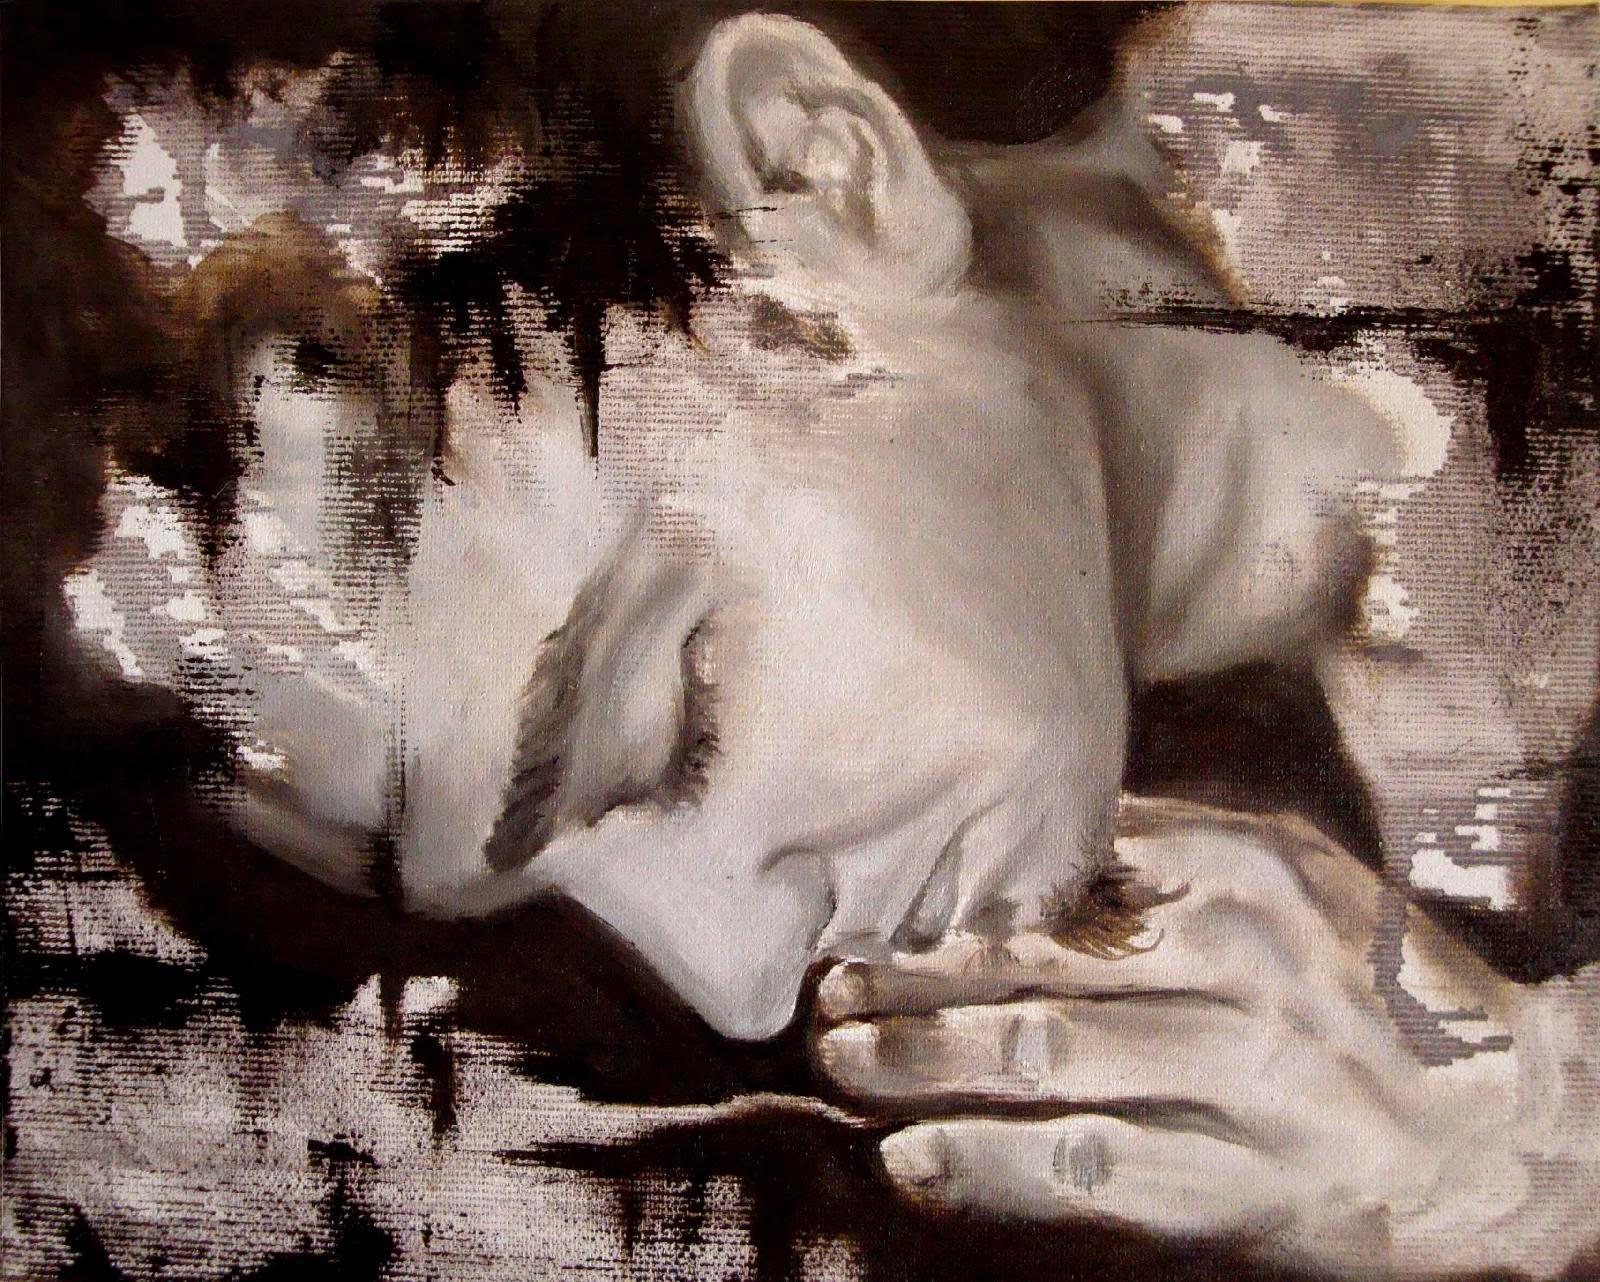 Hypnos 3 by Italian artist Beatrice Riva